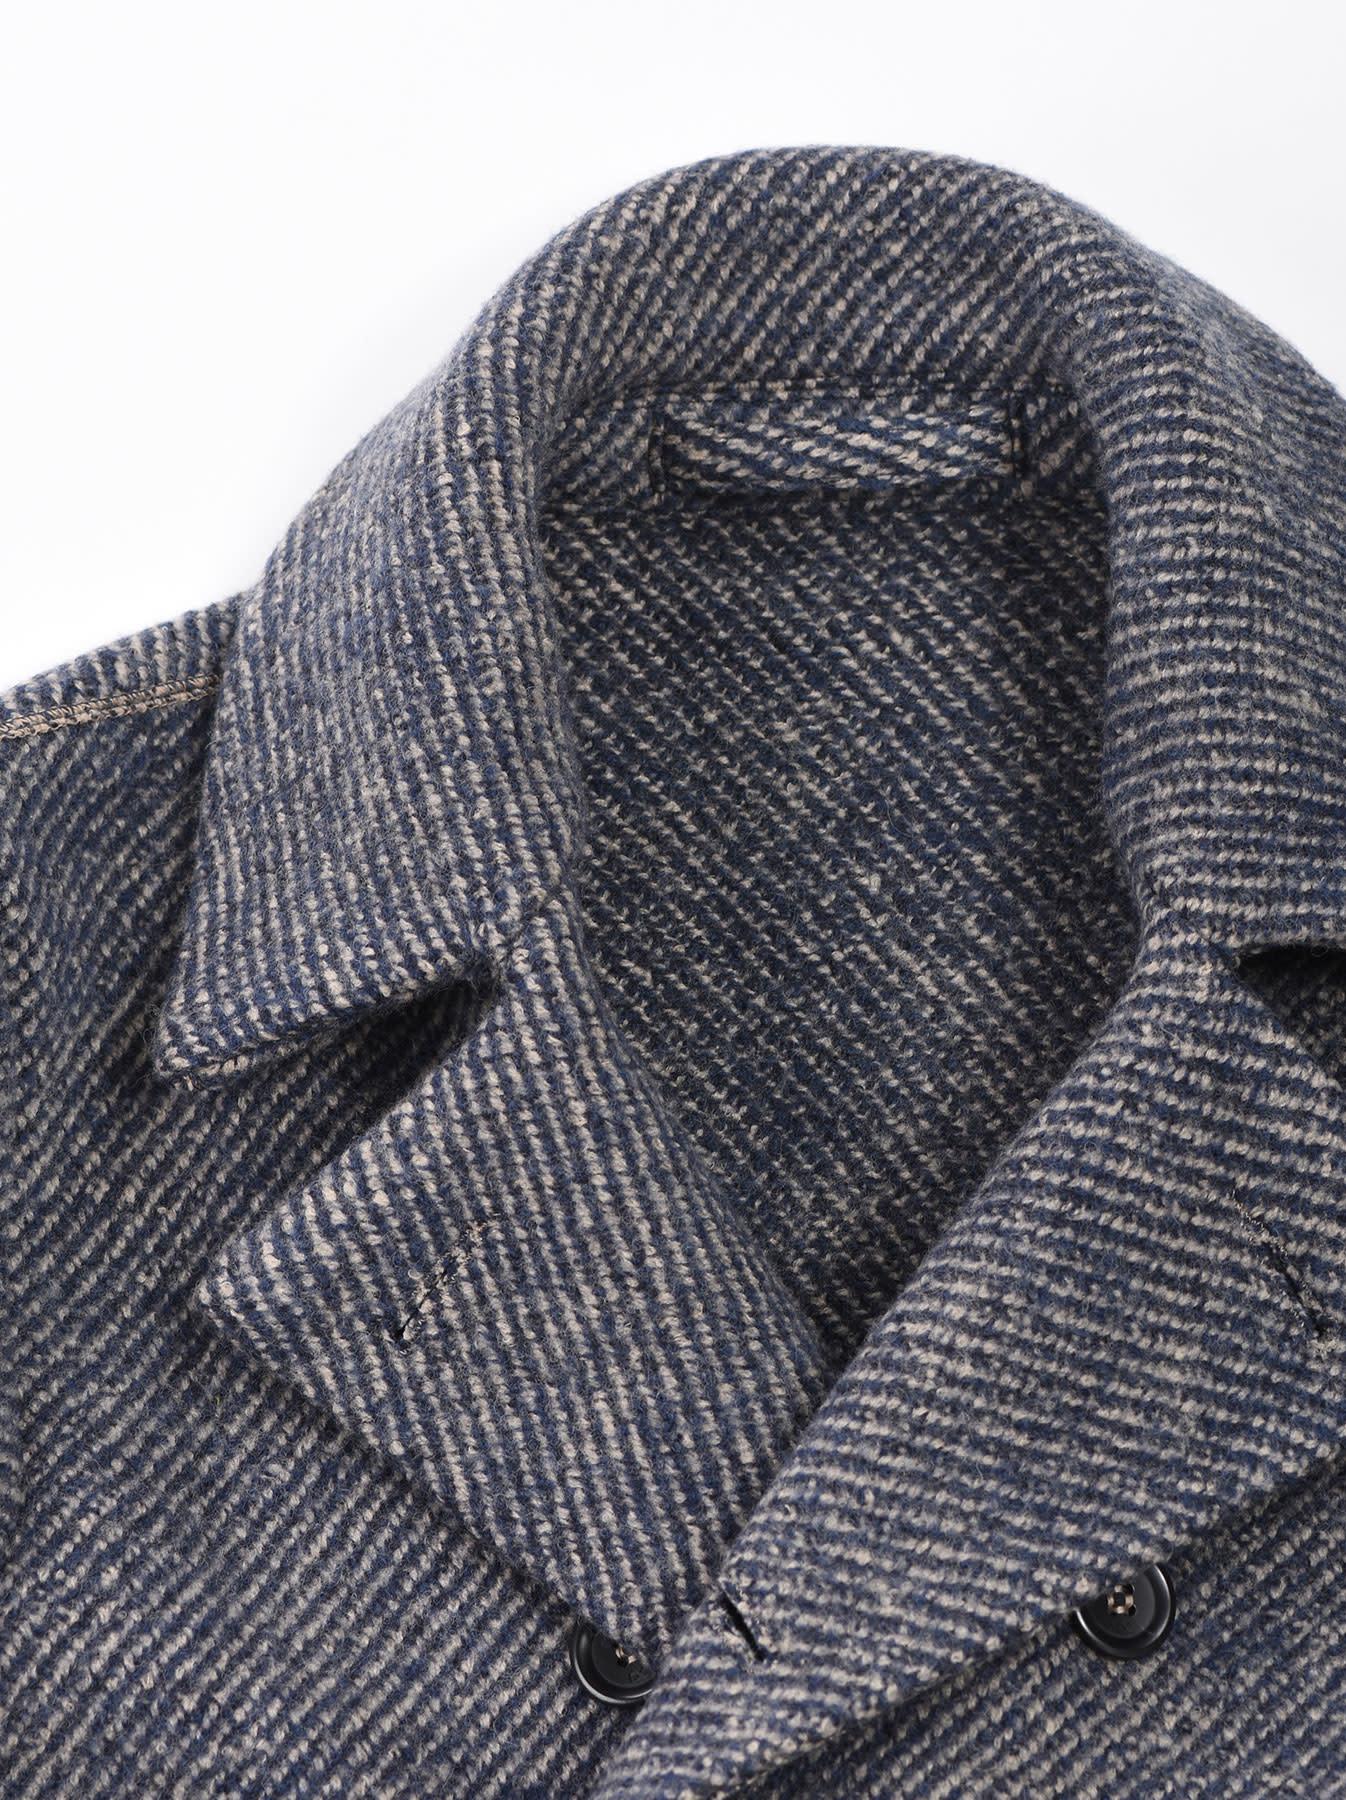 Denim Tweed Knit Coat-6